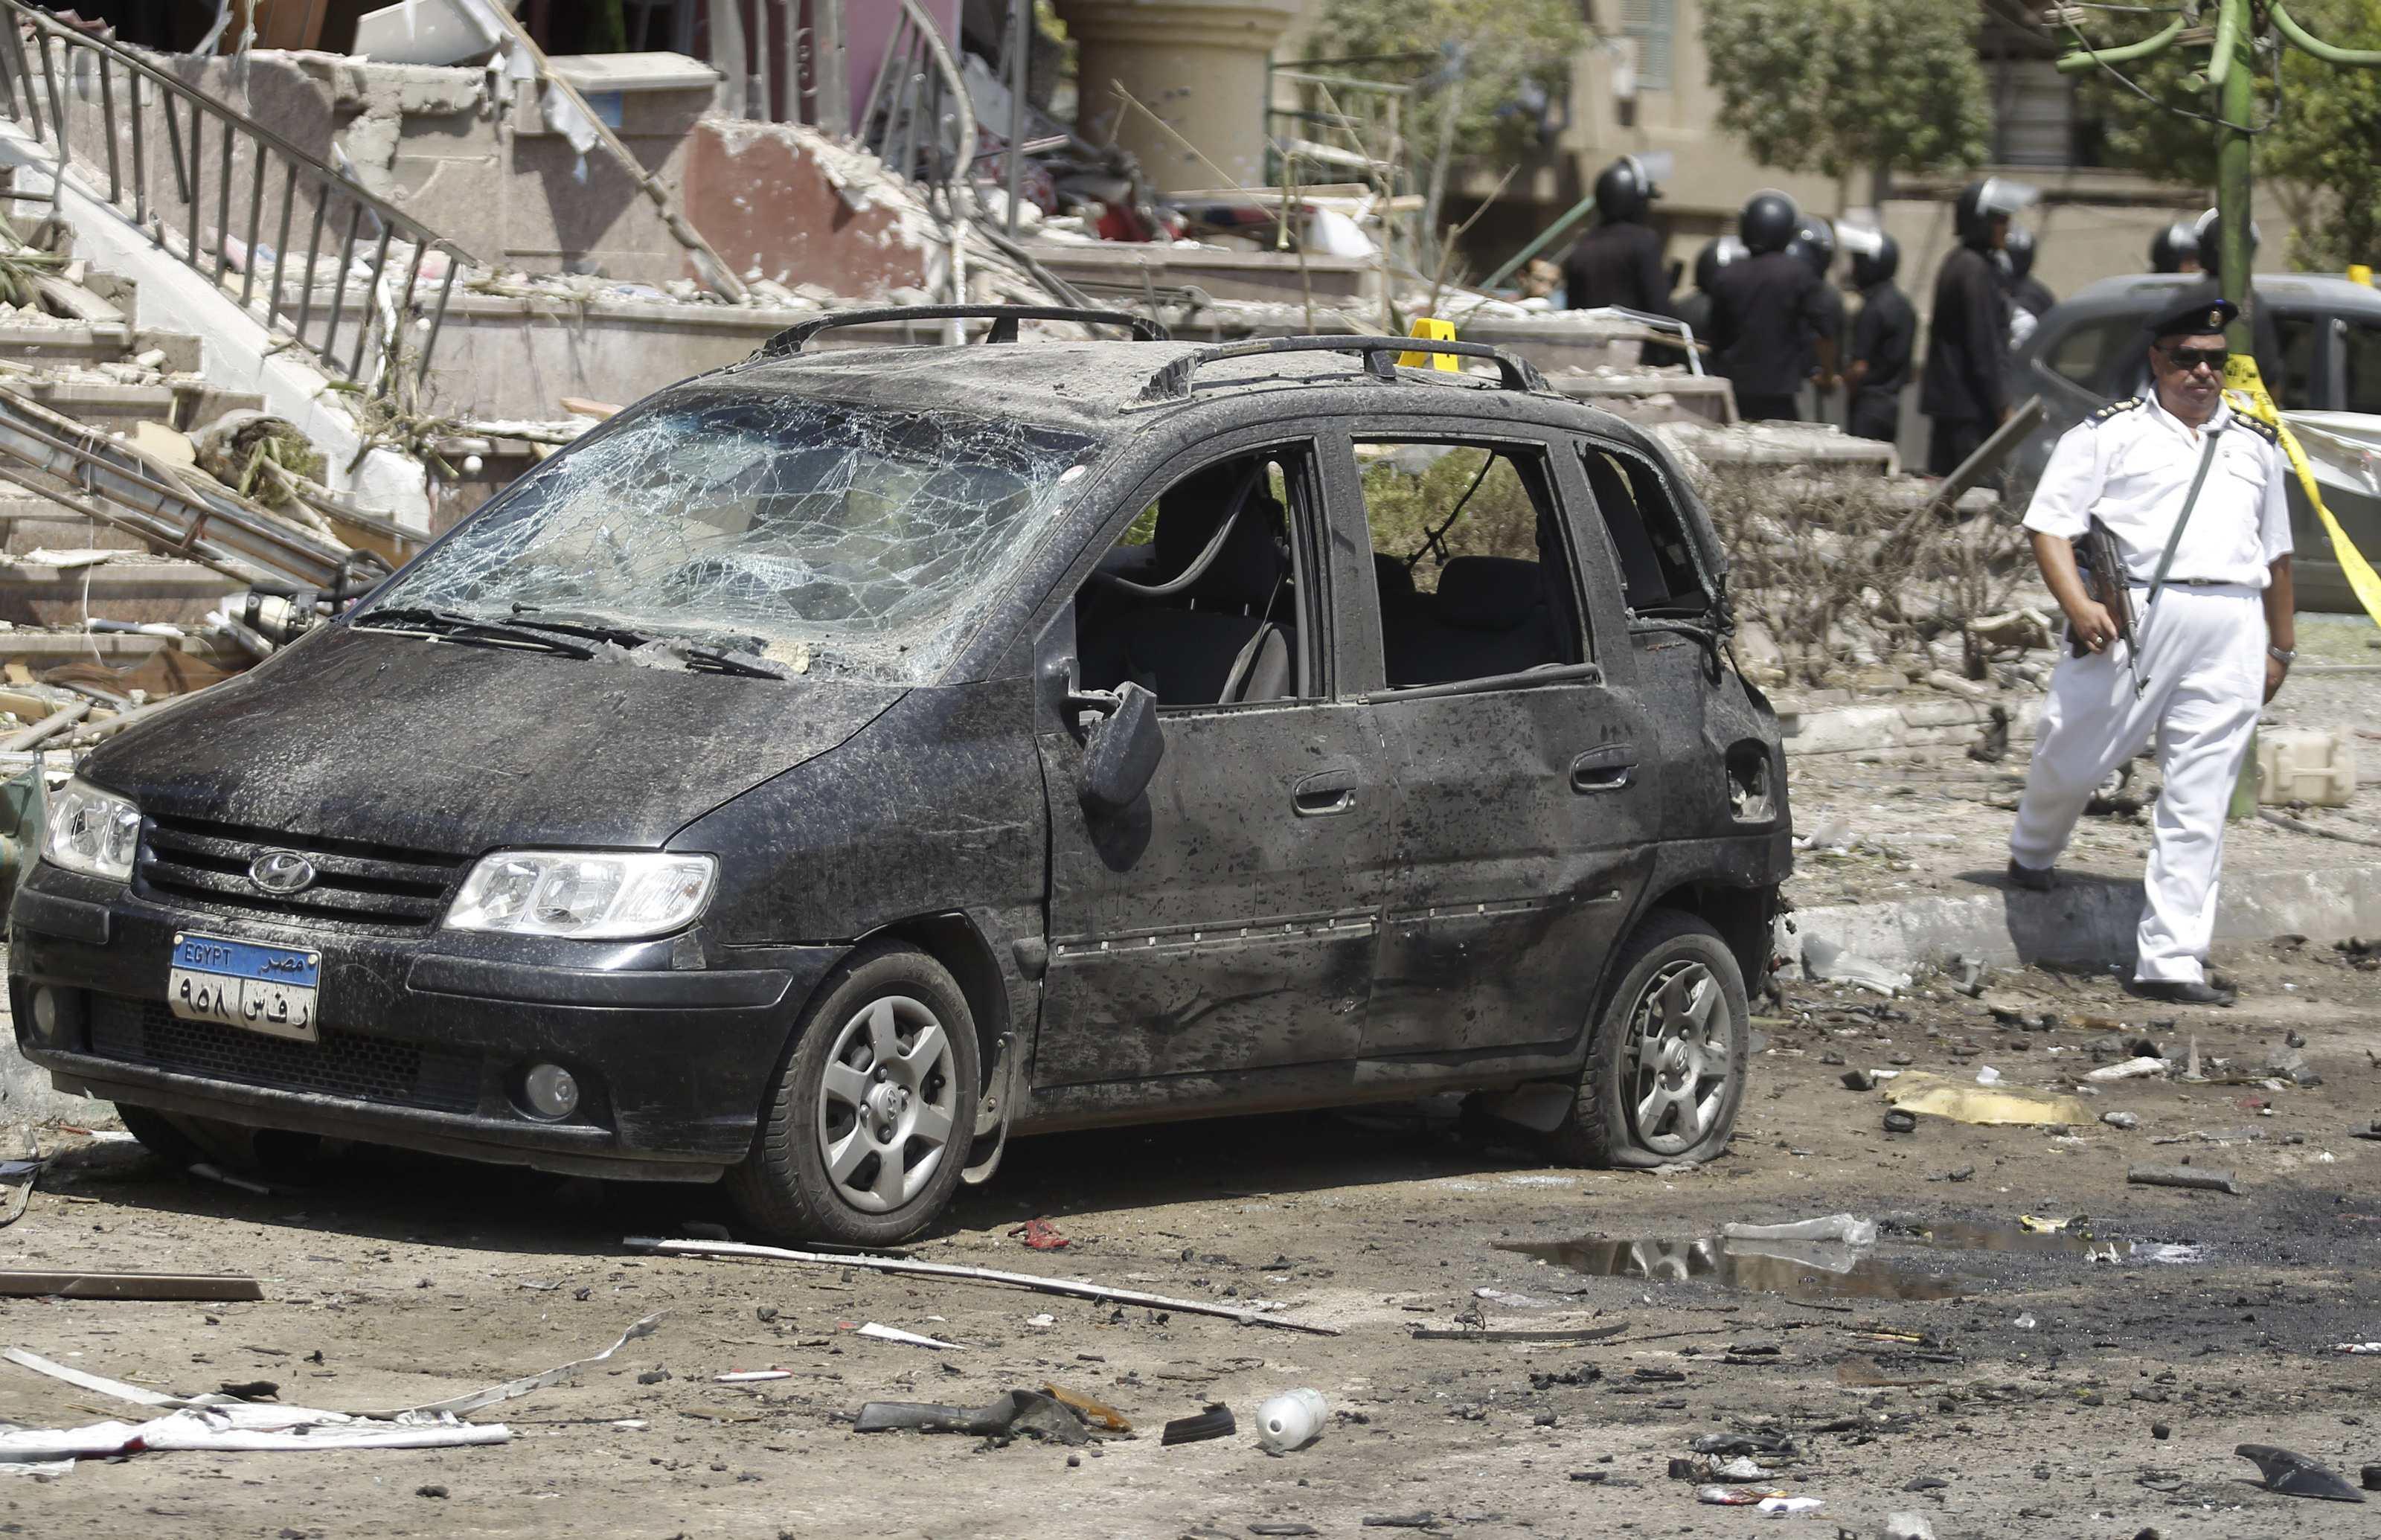 Hamas is training Egyptian Islamists - Egypt state TV